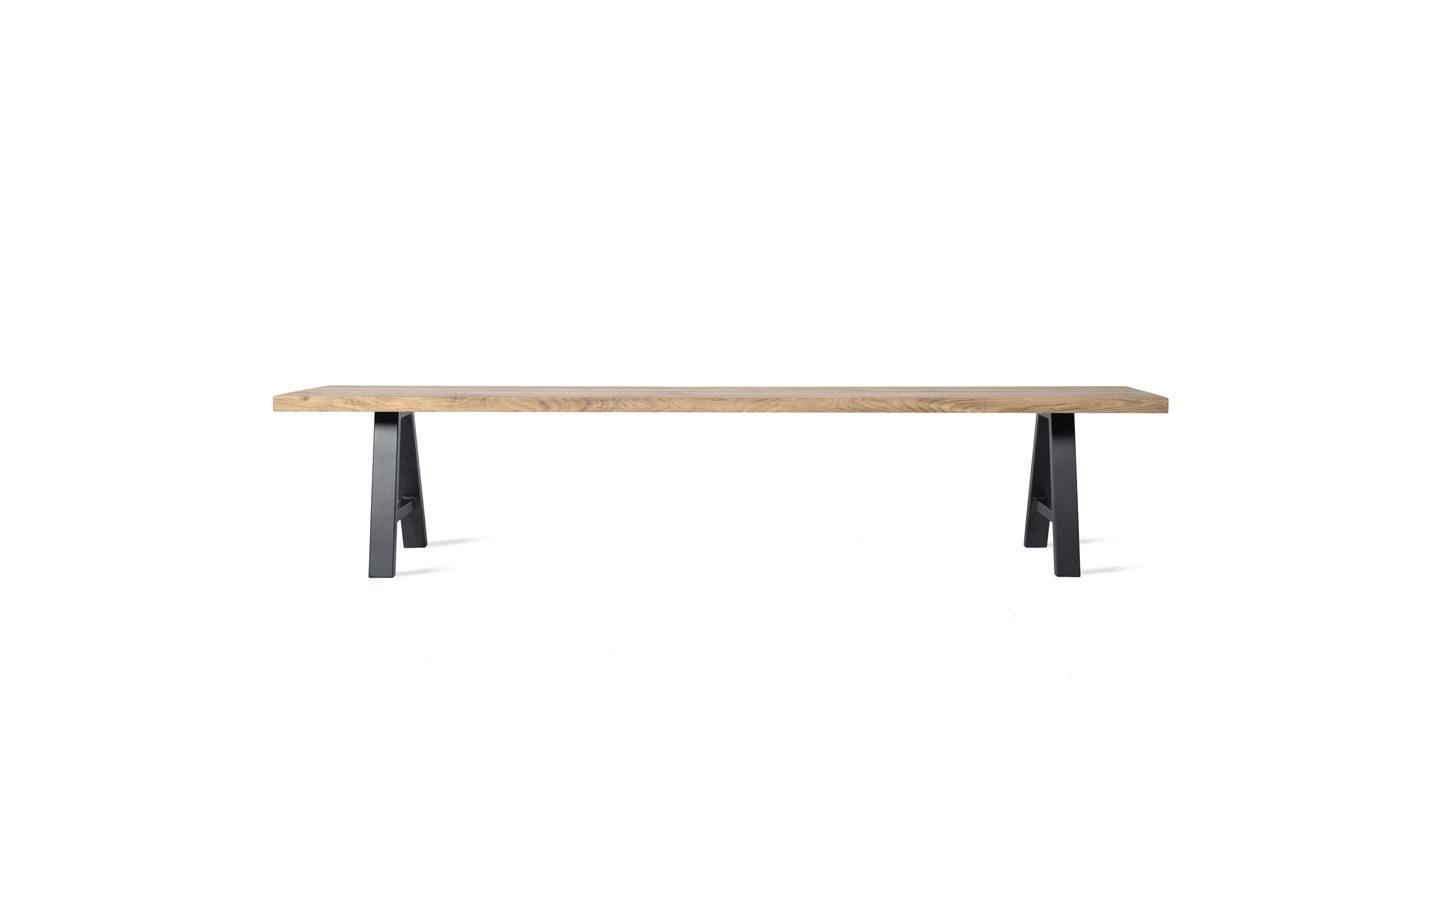 Albert-bench-black-base-01